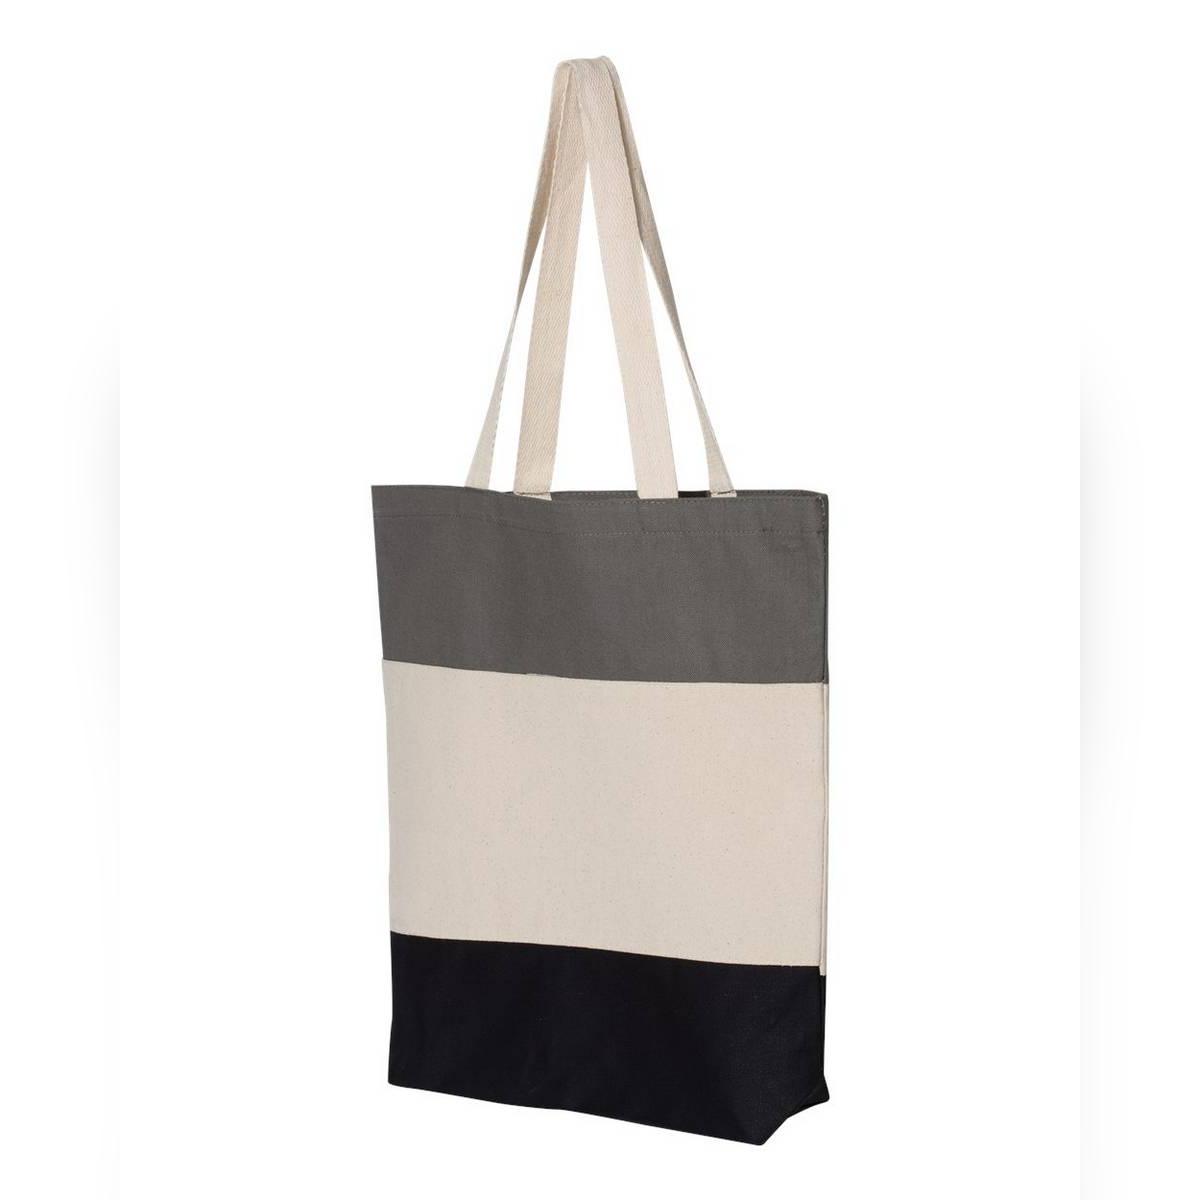 Heavy Canvas Tri-Color Fancy Canvas Tote Bags - Black/Natural/Light Grey